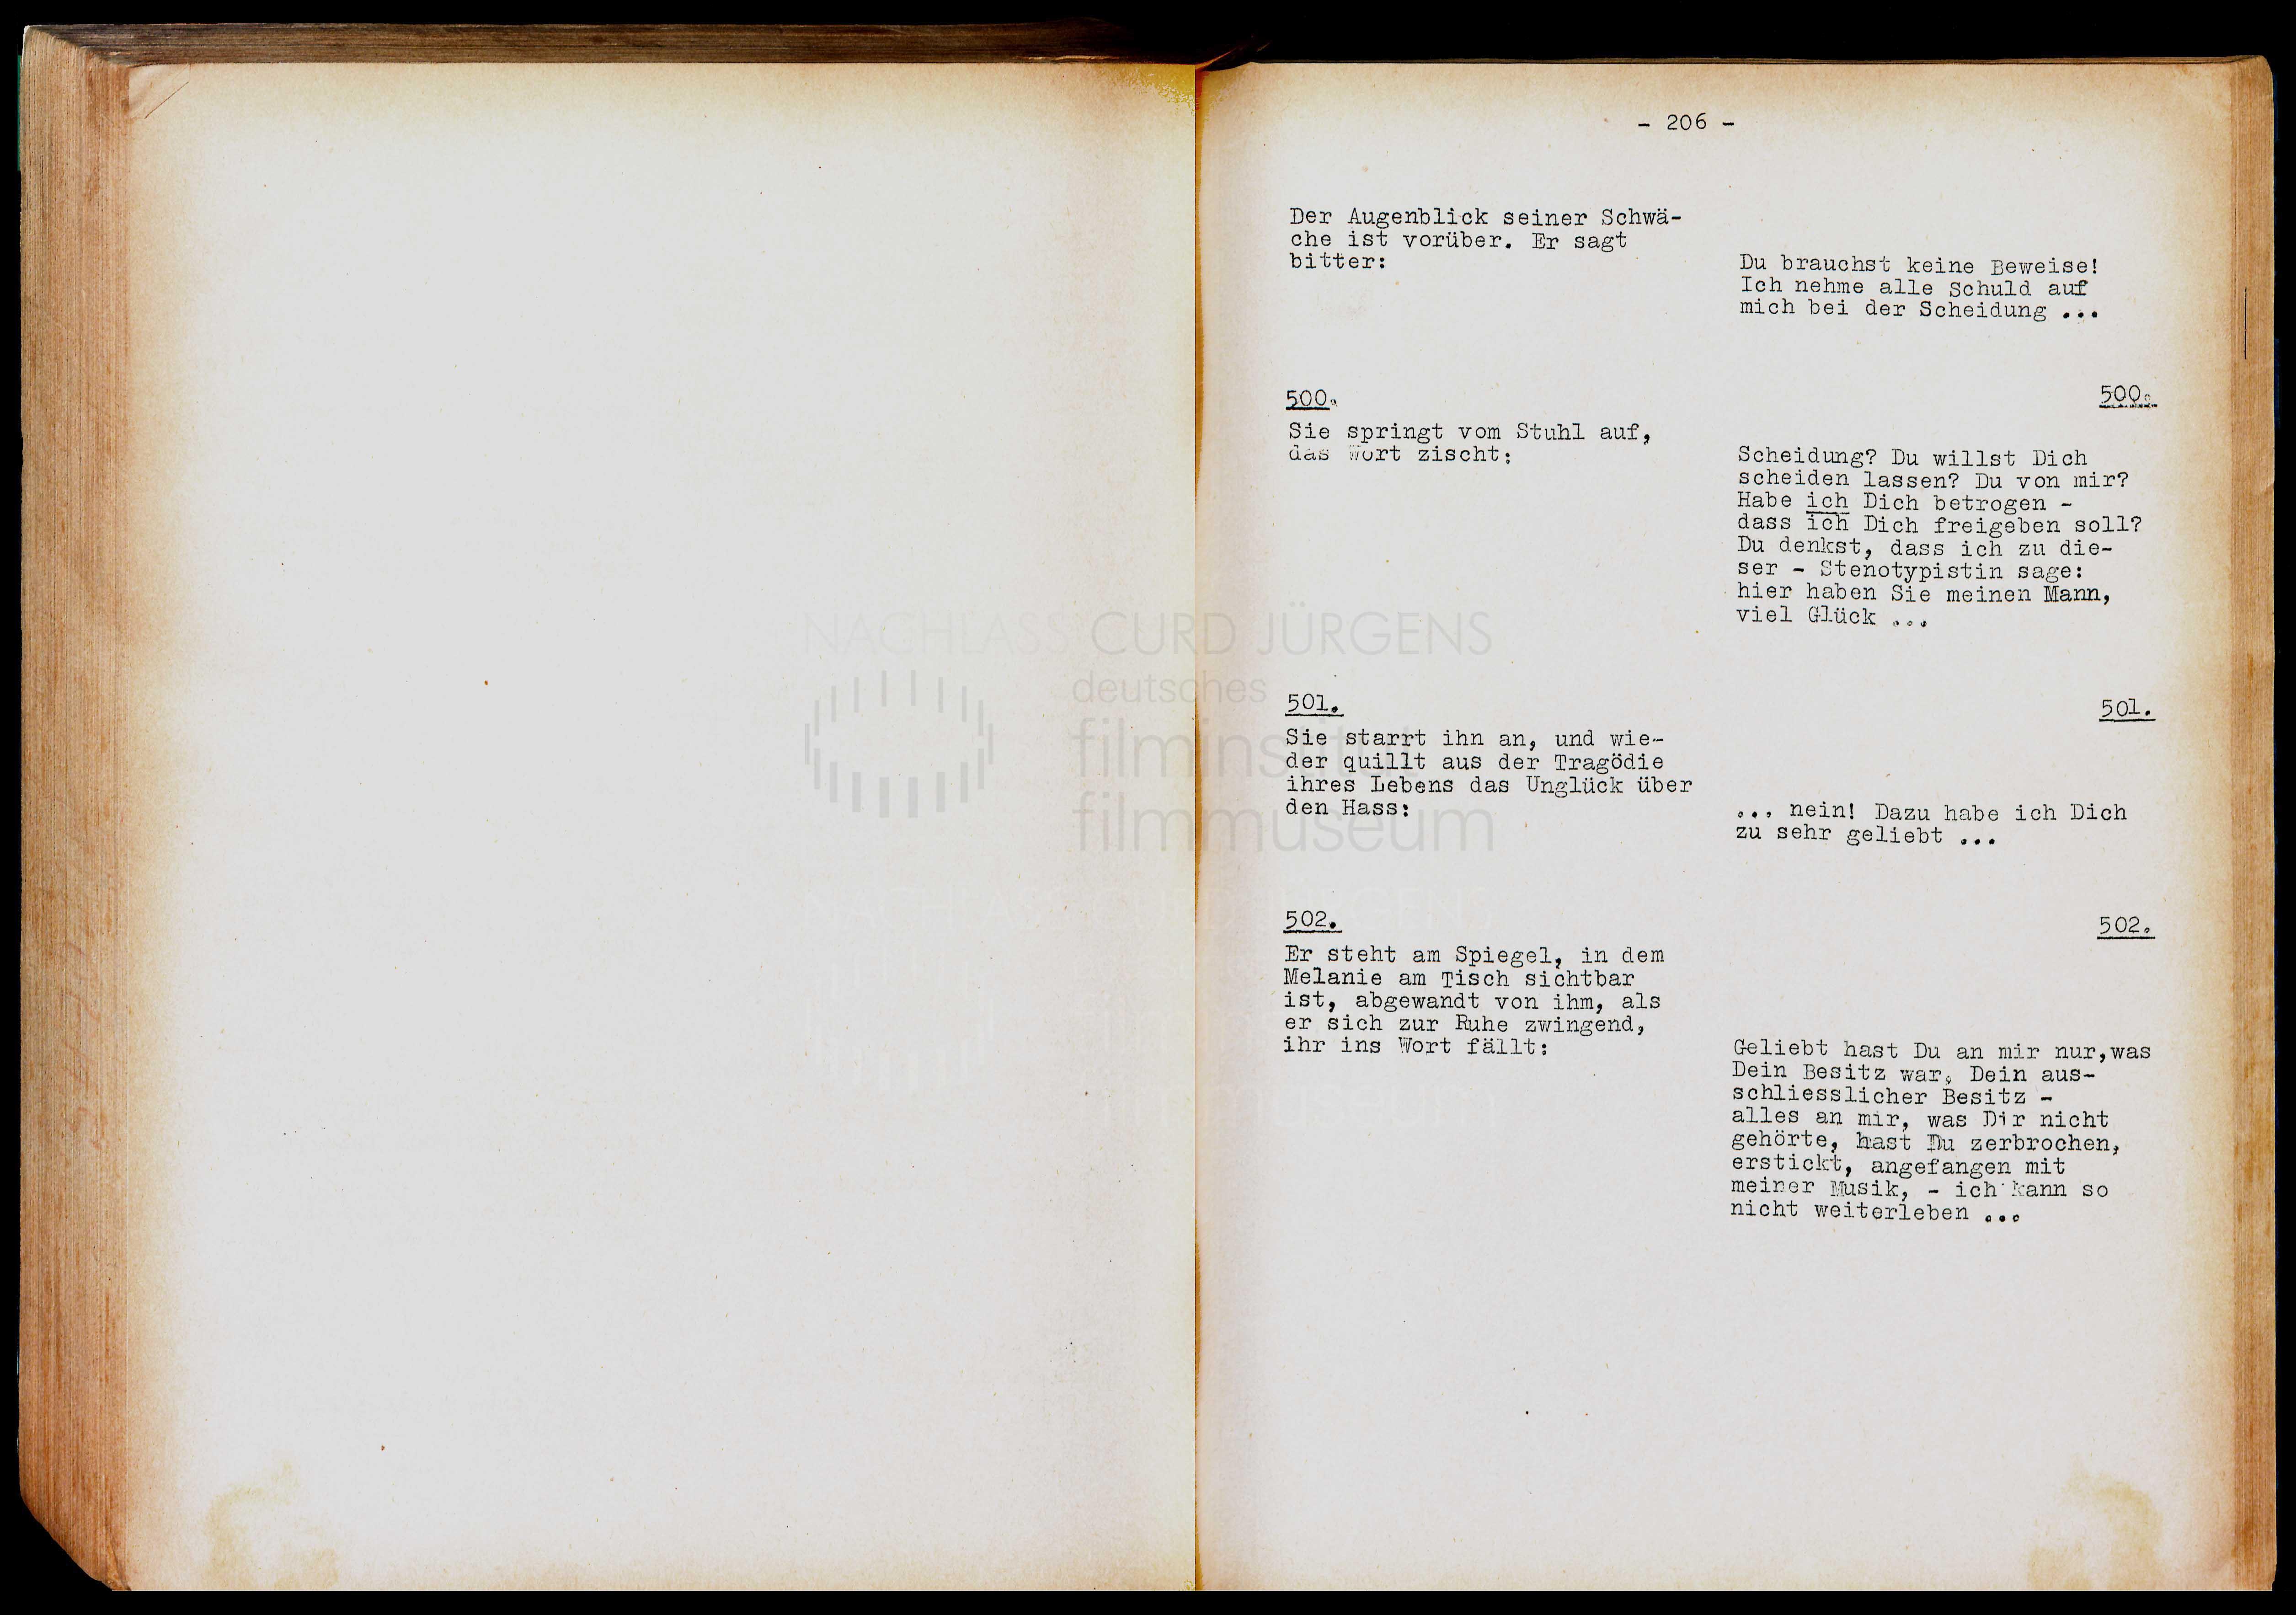 TEUFEL IN SEIDE (1956) Drehbuch (Auszug) 2